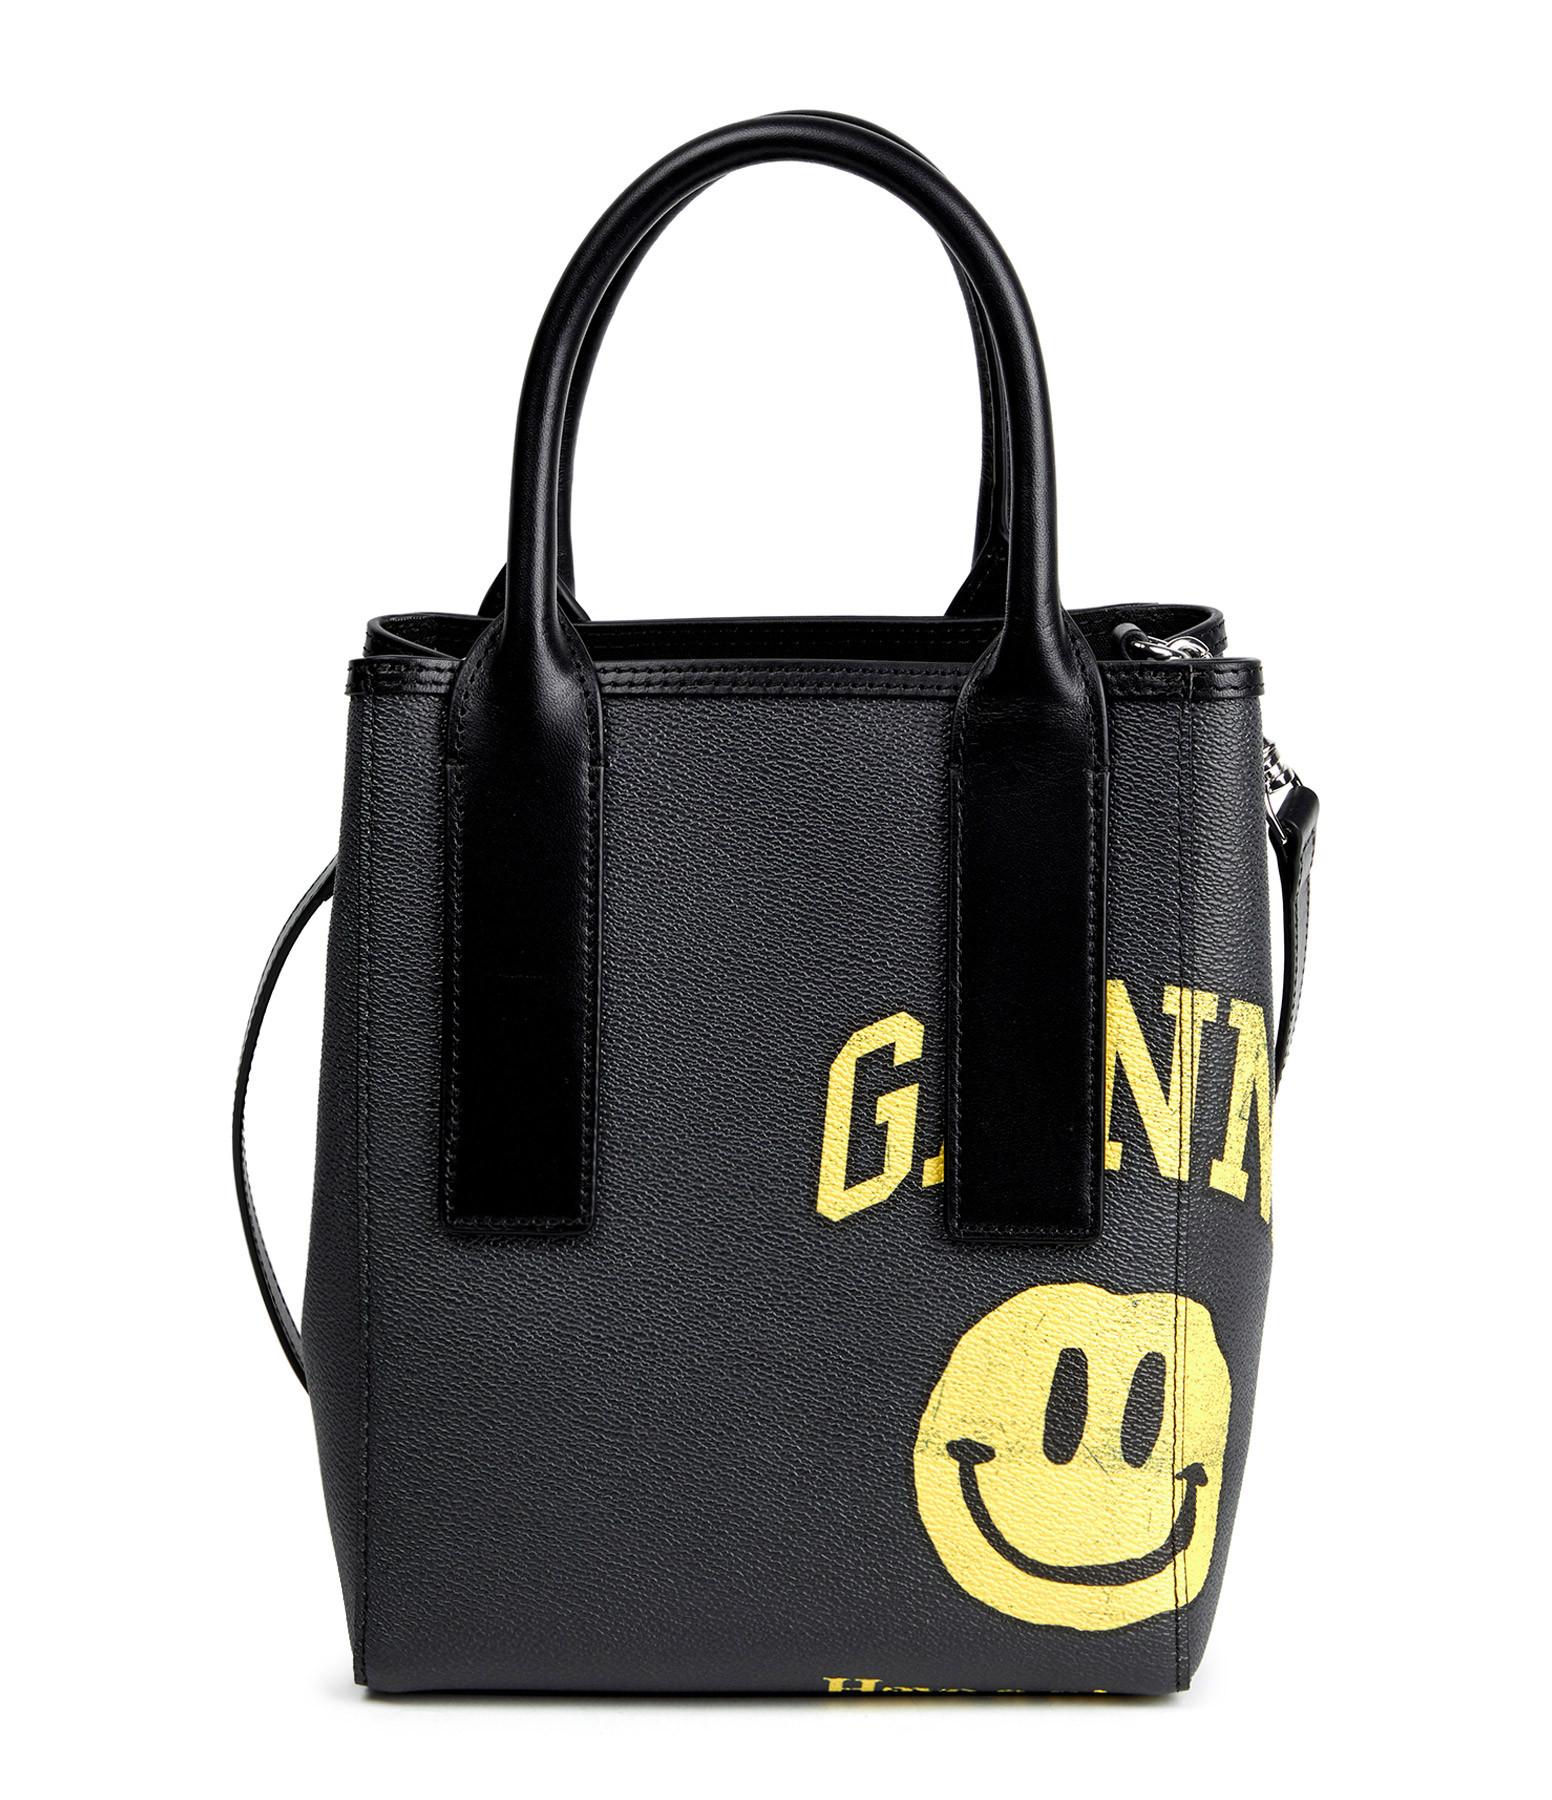 GANNI - Sac Bandoulière Cuir Toile Logo Ganni Noir